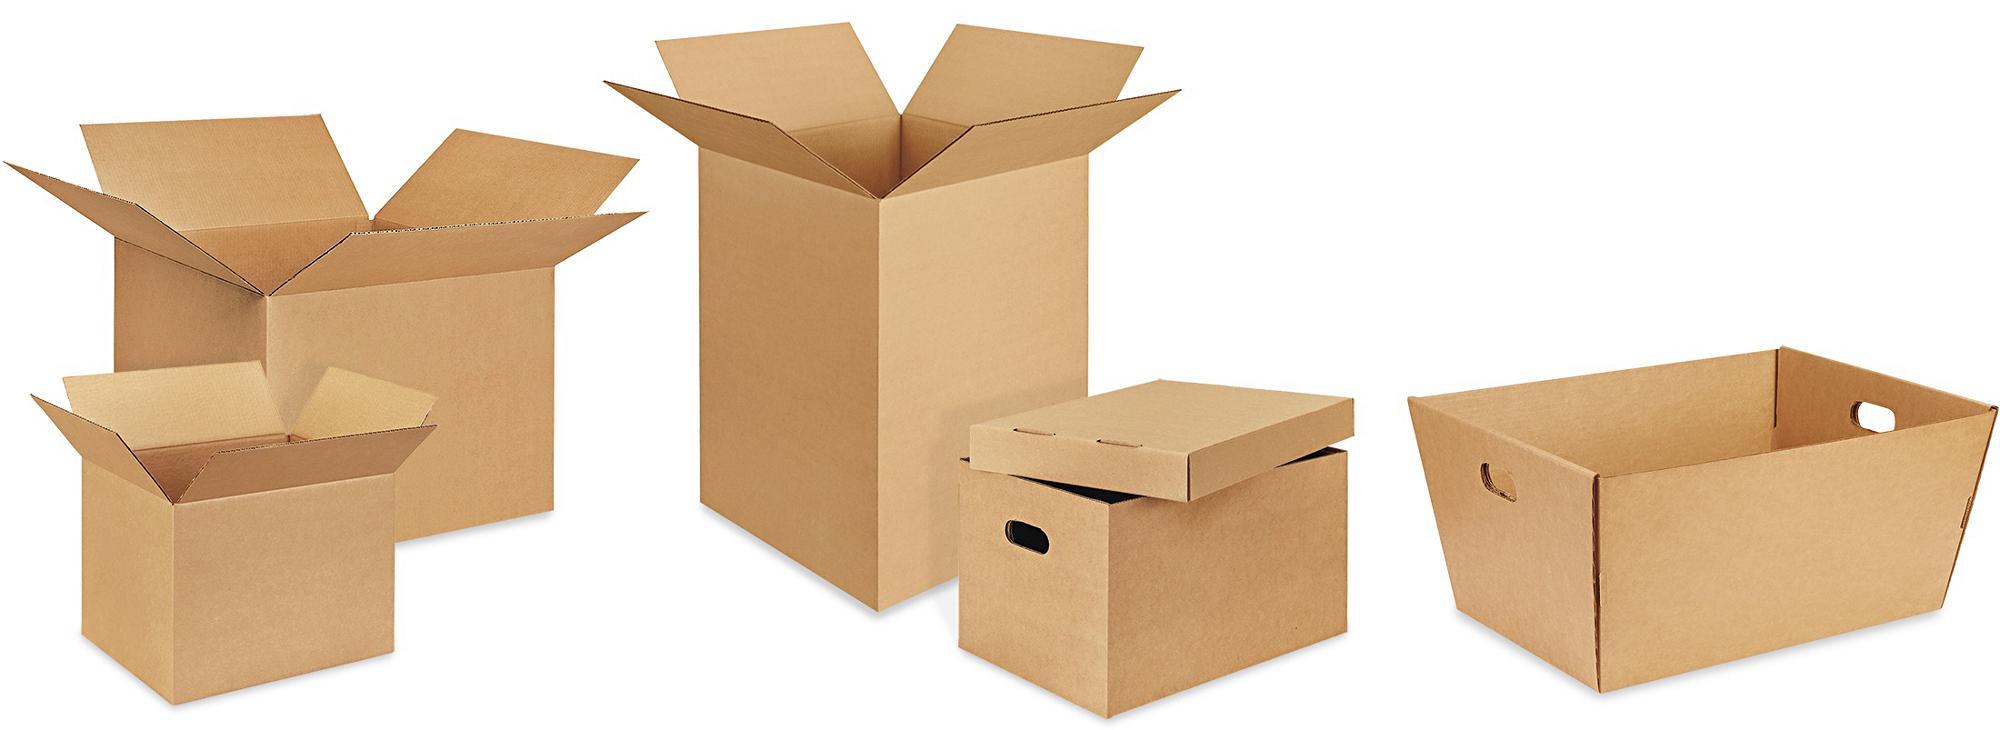 Packing/Storage Boxes